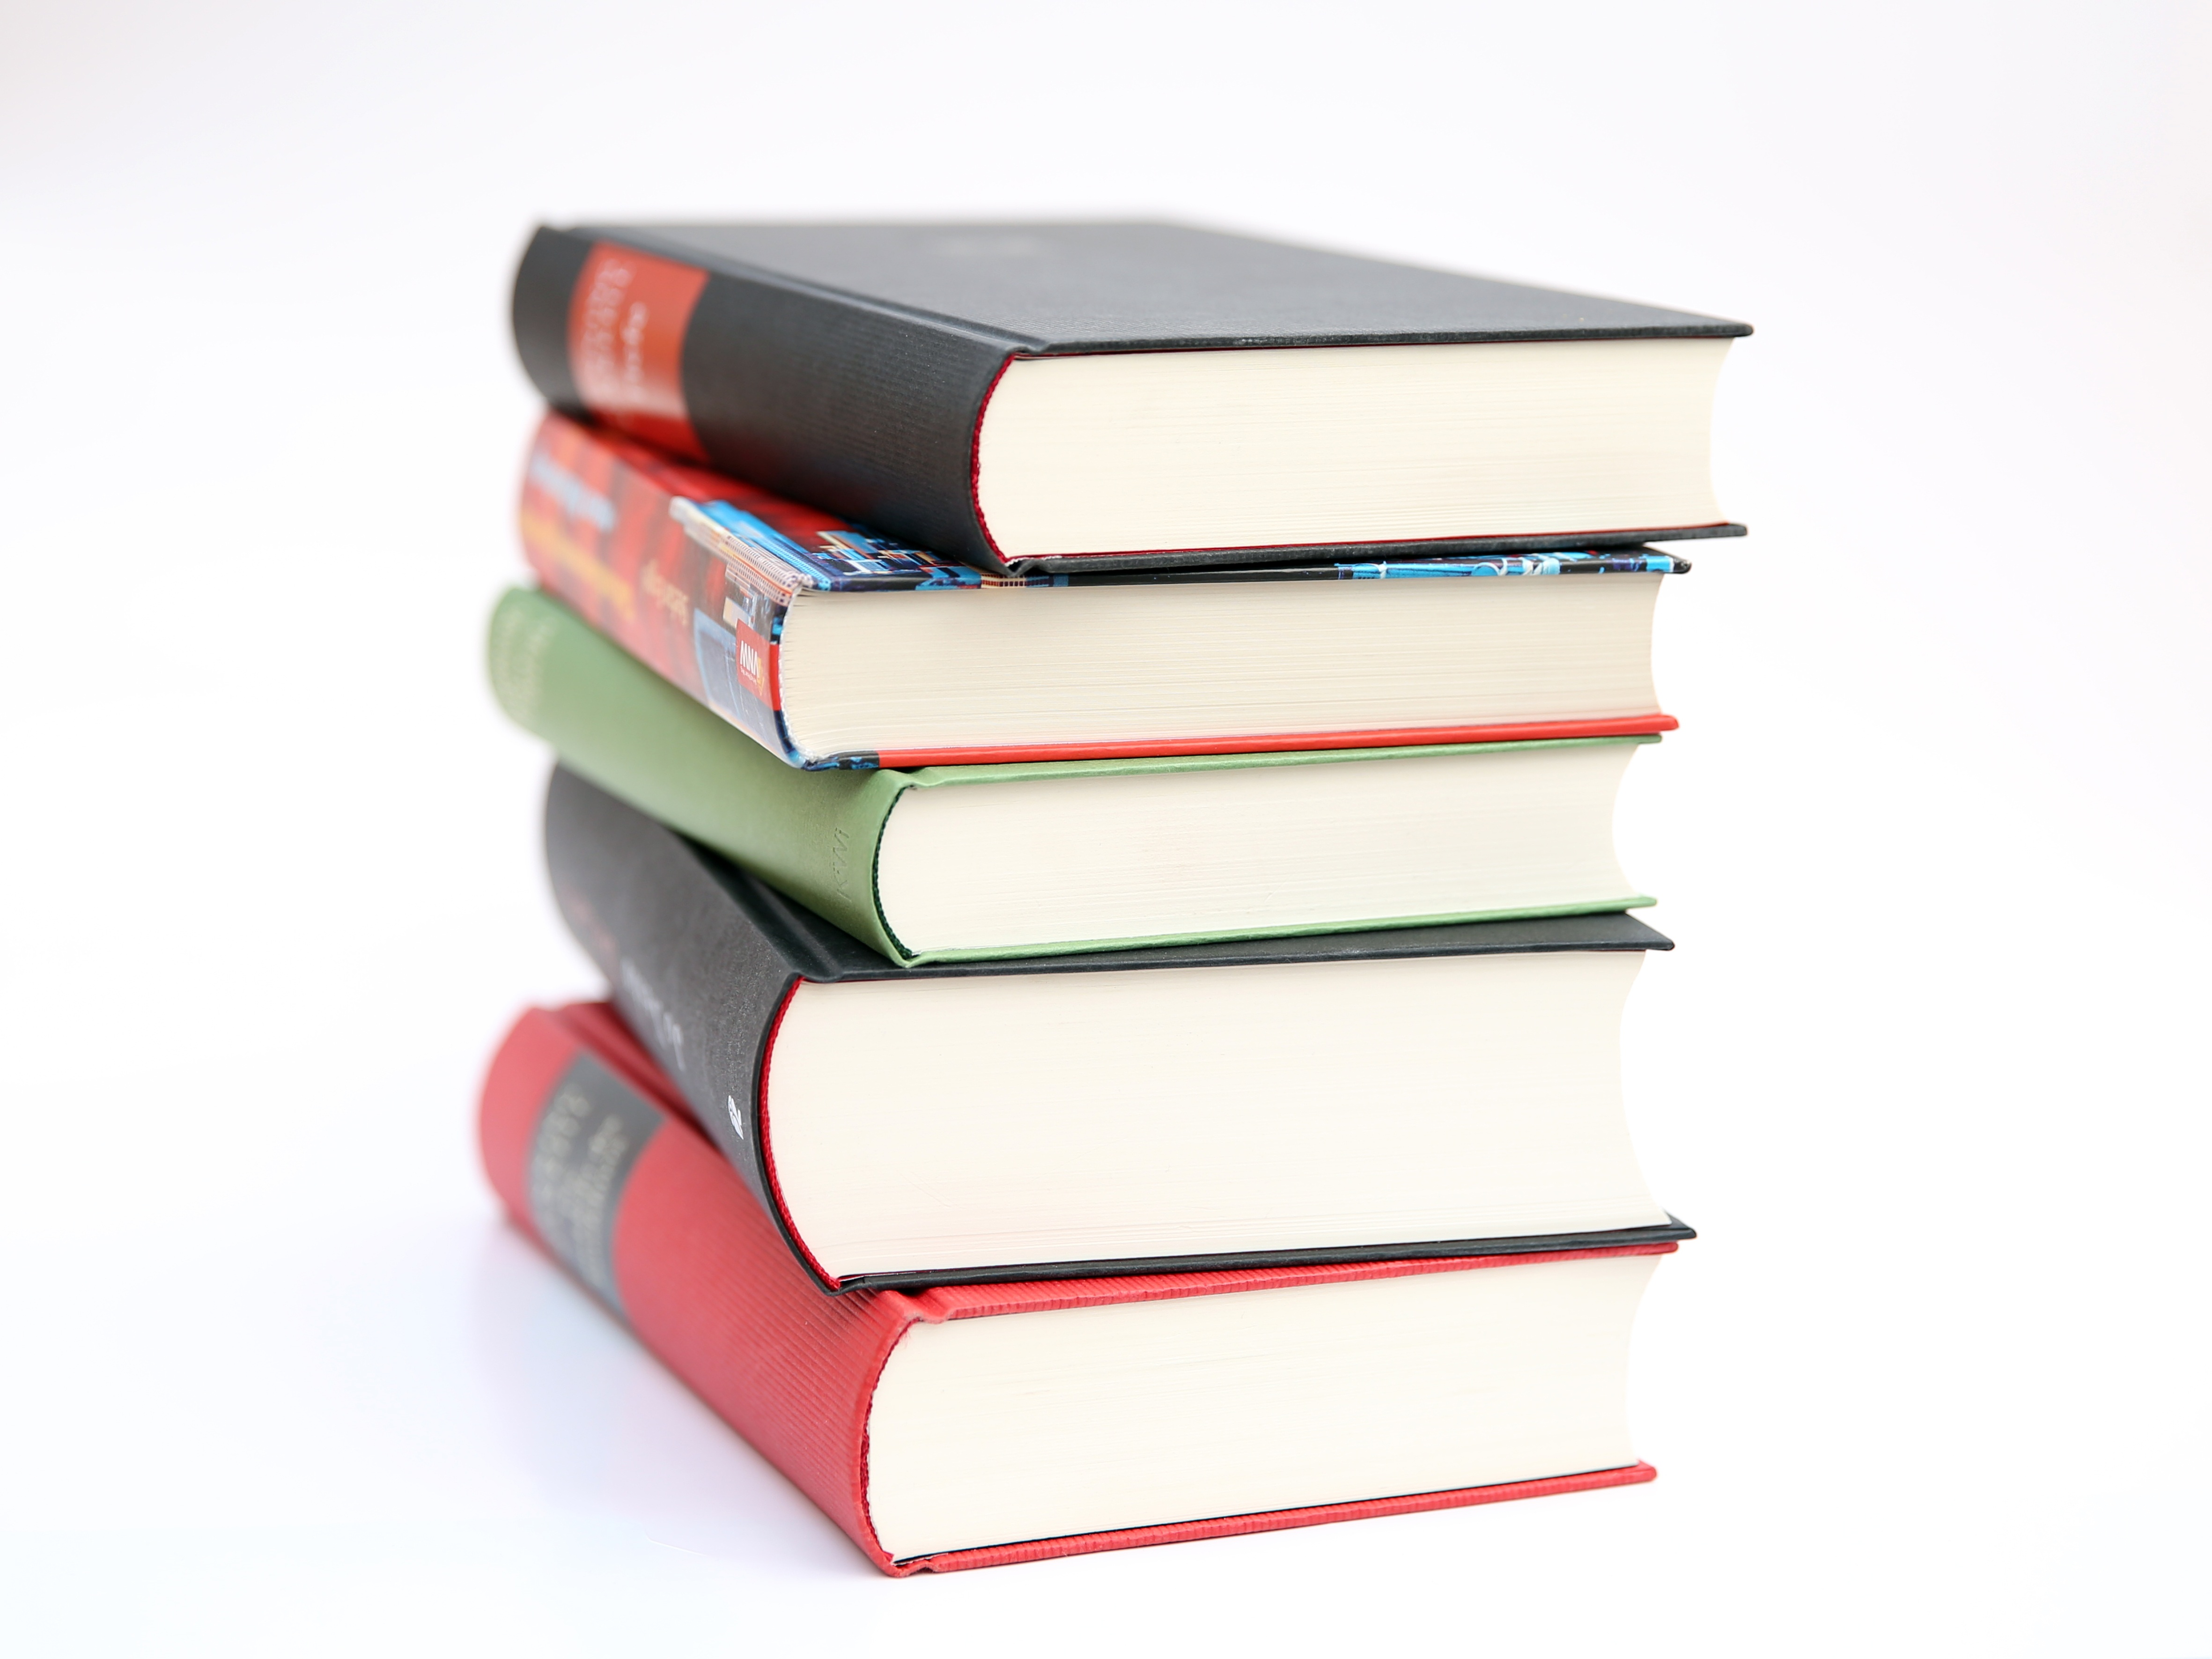 Free stock photos of books · Pexels.